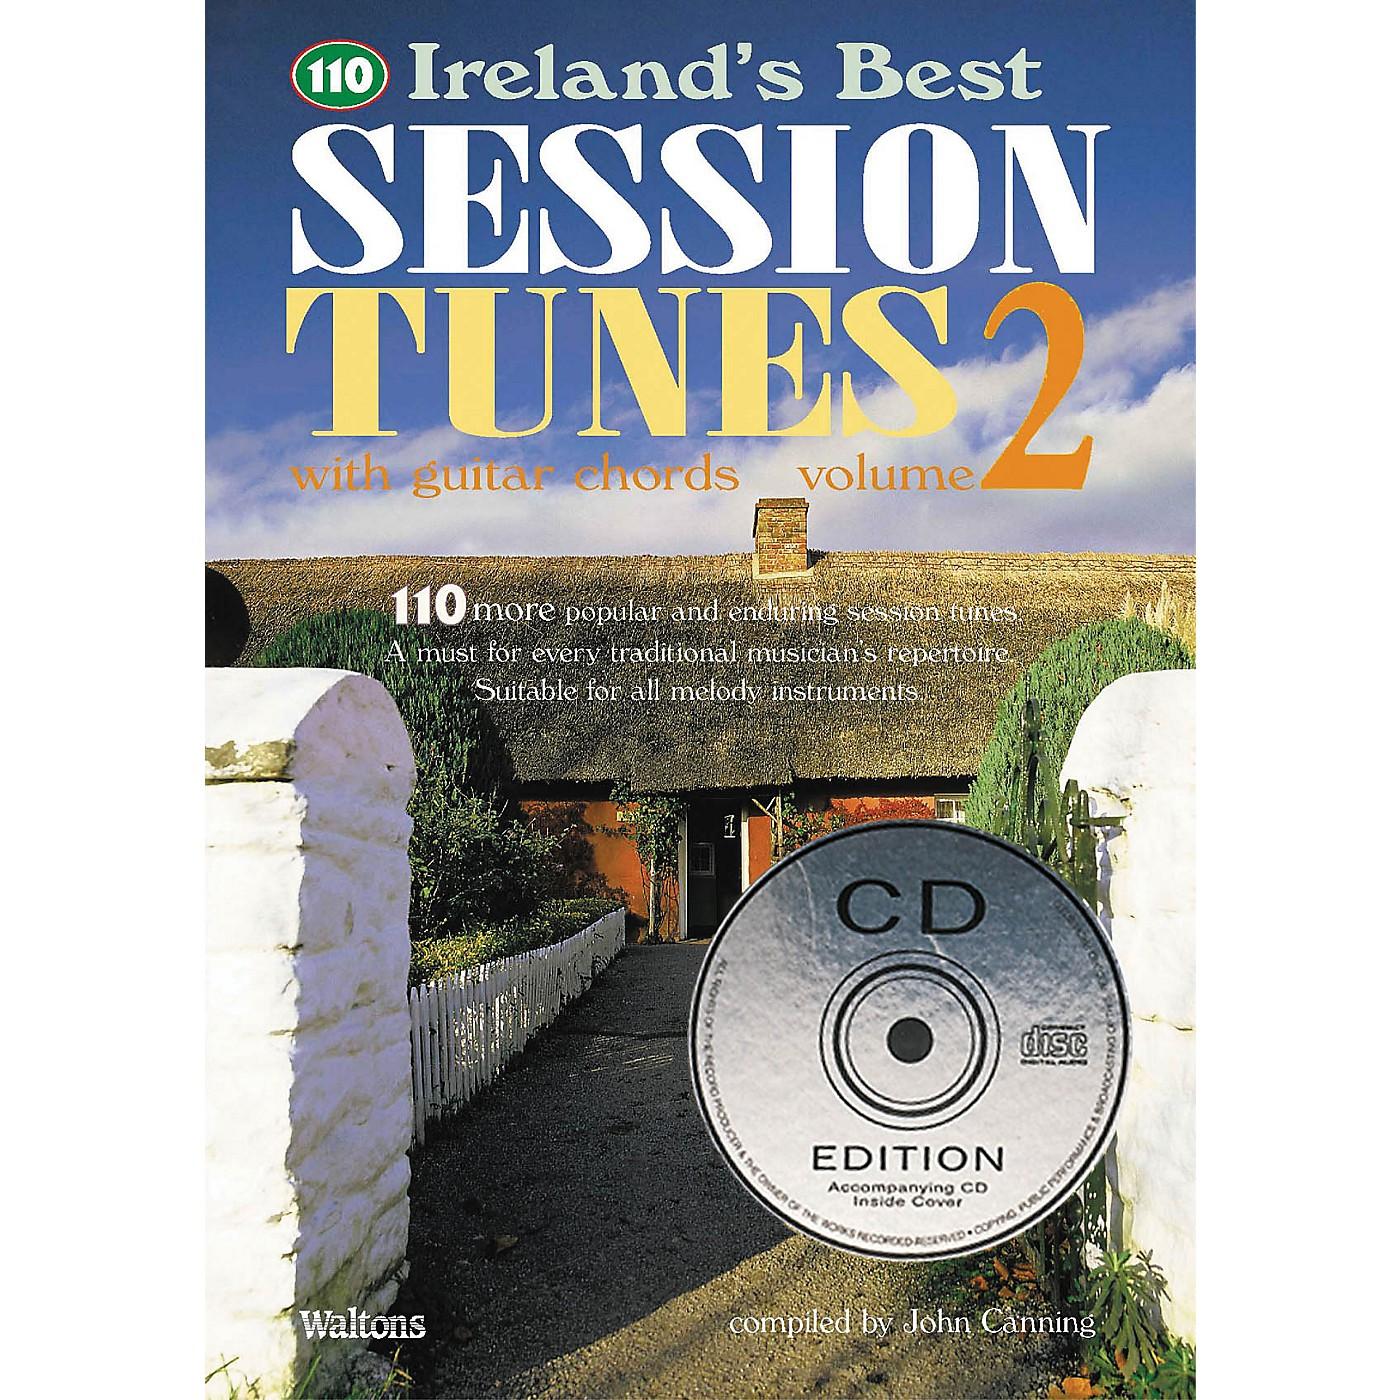 Waltons 110 Ireland's Best Session Tunes - Volume 2 (with Guitar Chords) Waltons Irish Music Books Series thumbnail